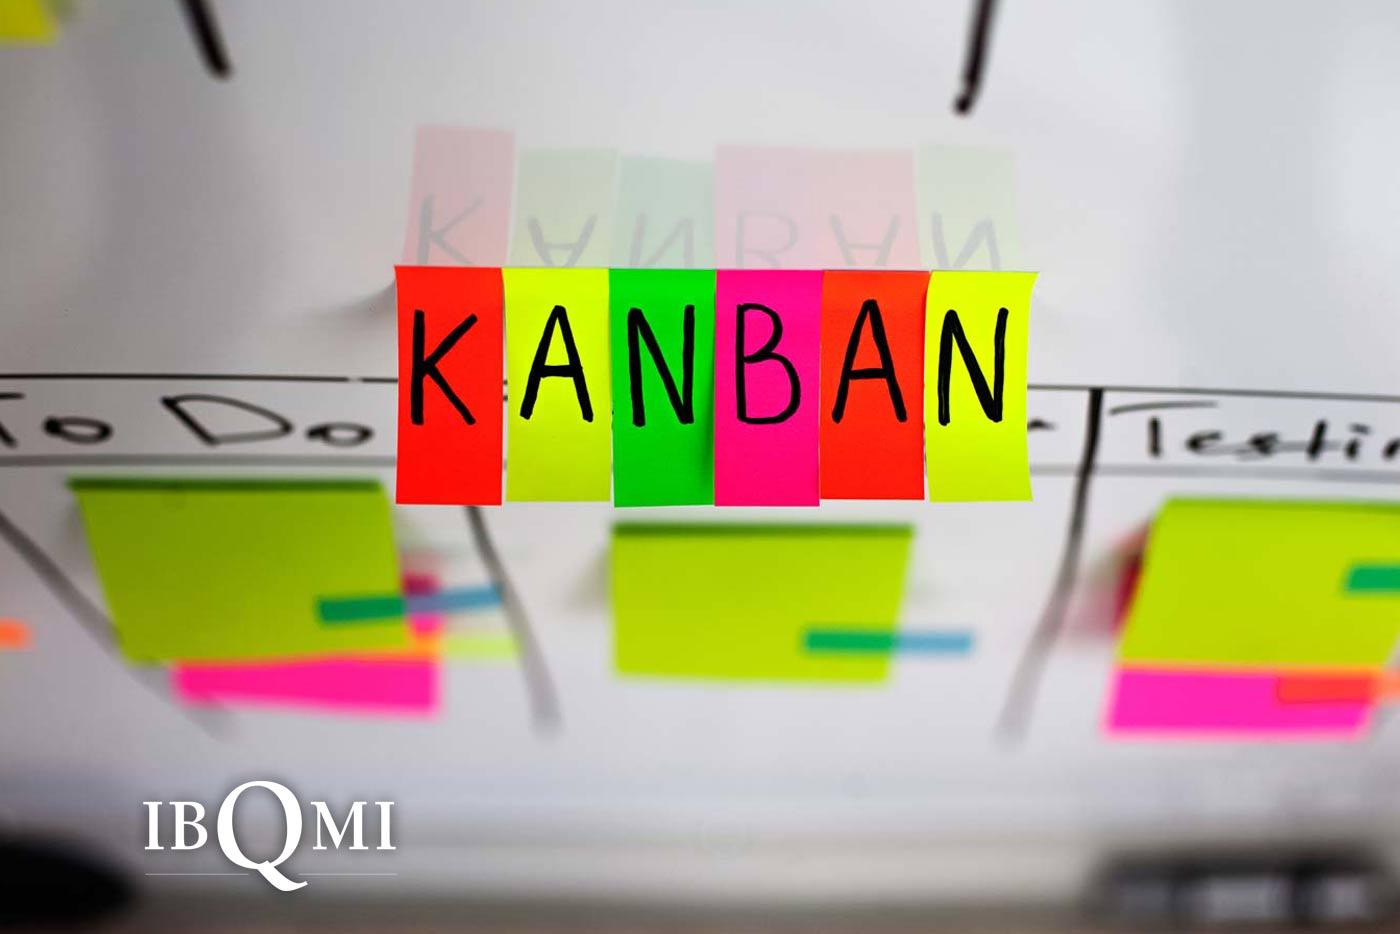 Kanban stay organized